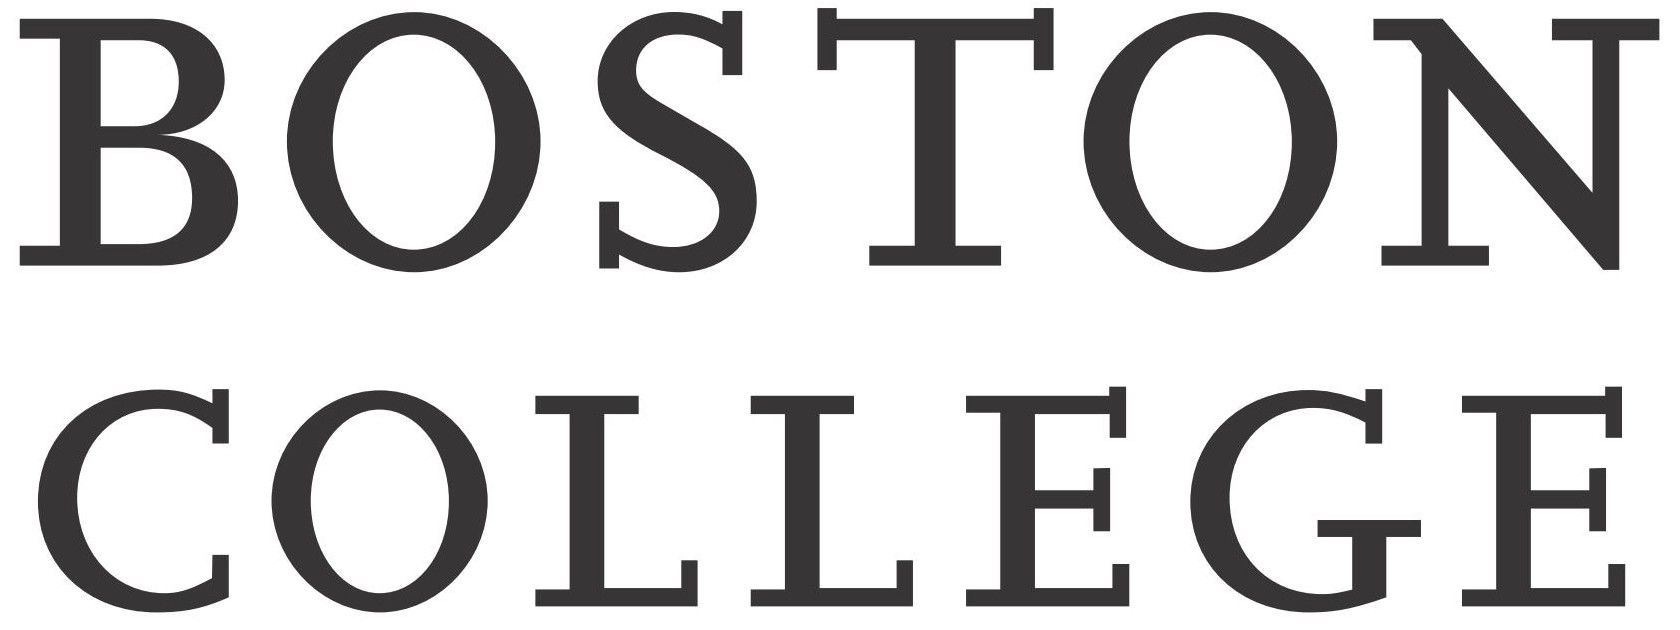 Boston College Logo (BC) Vector EPS Free Download, Logo, Icons, Brand Emblems